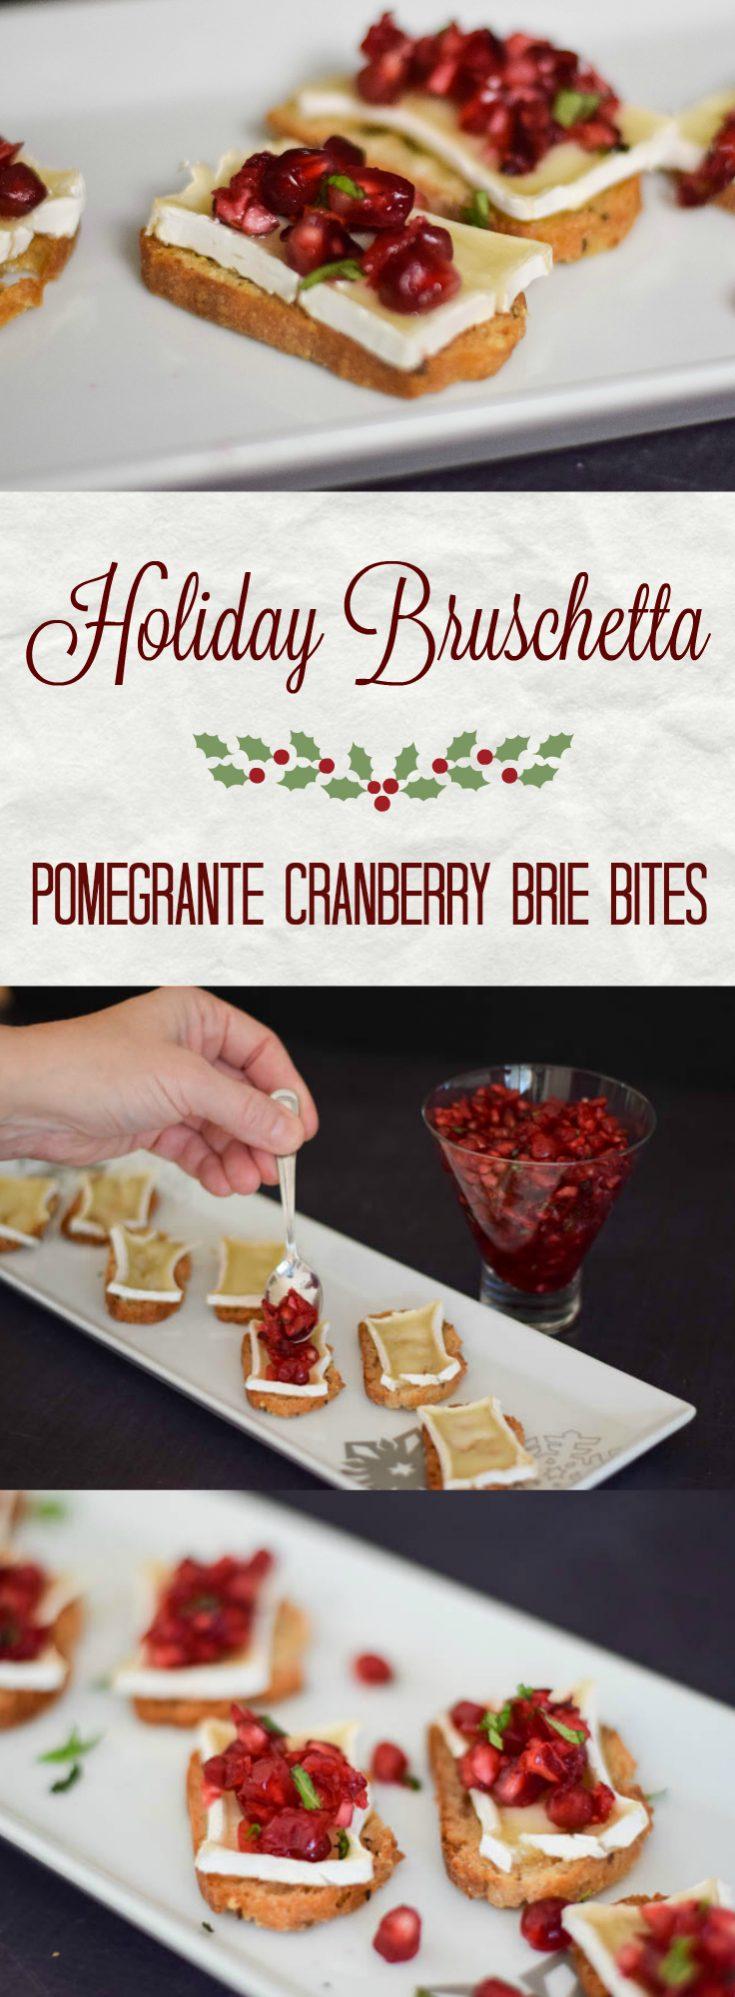 Holiday Bruschetta #appetizer #holidayappetizer #pomengranate #briecheese